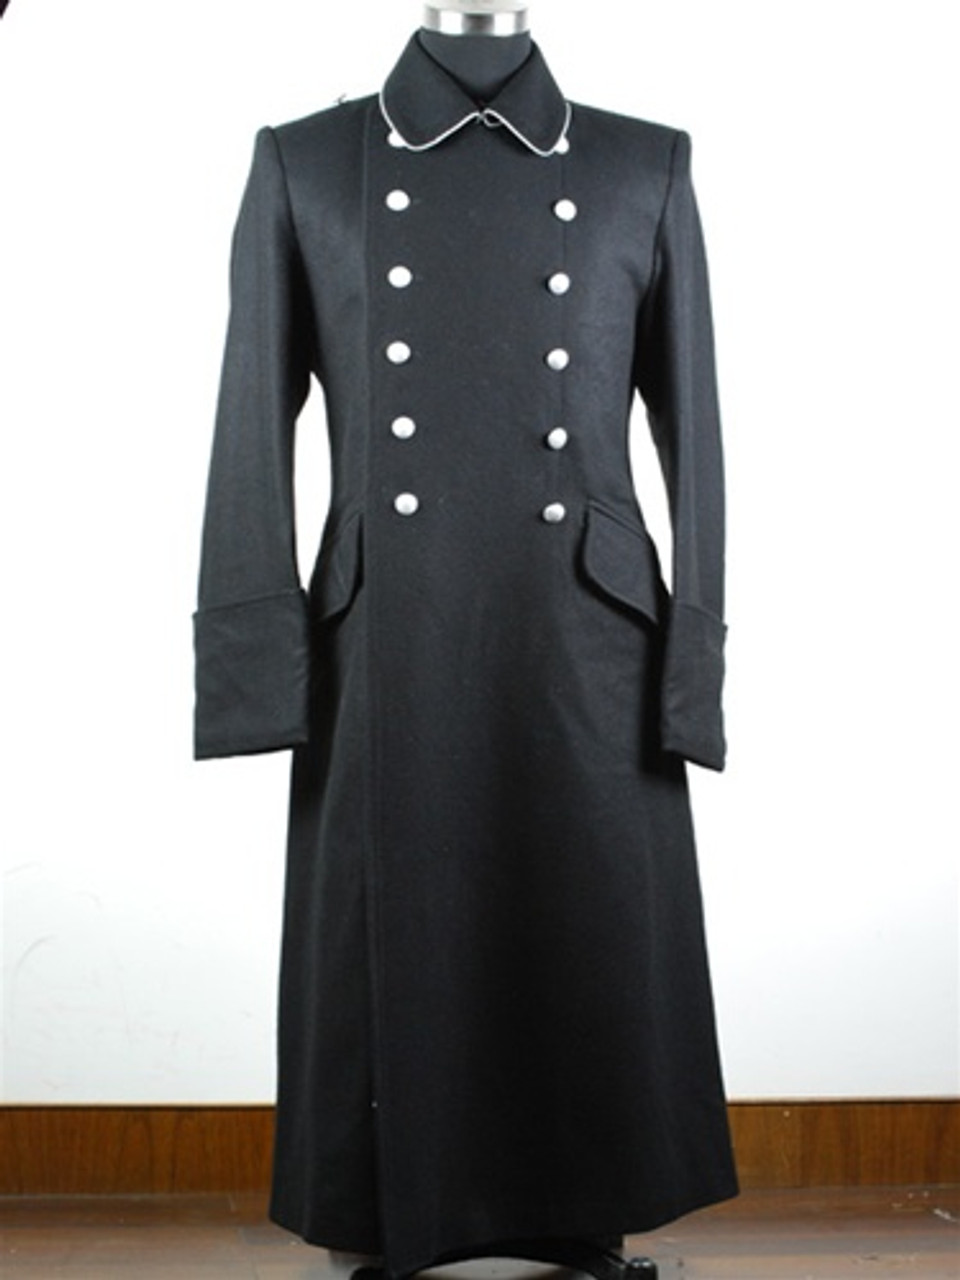 SS M32 Officer Gabardine Greatcoat from Hessen Antique